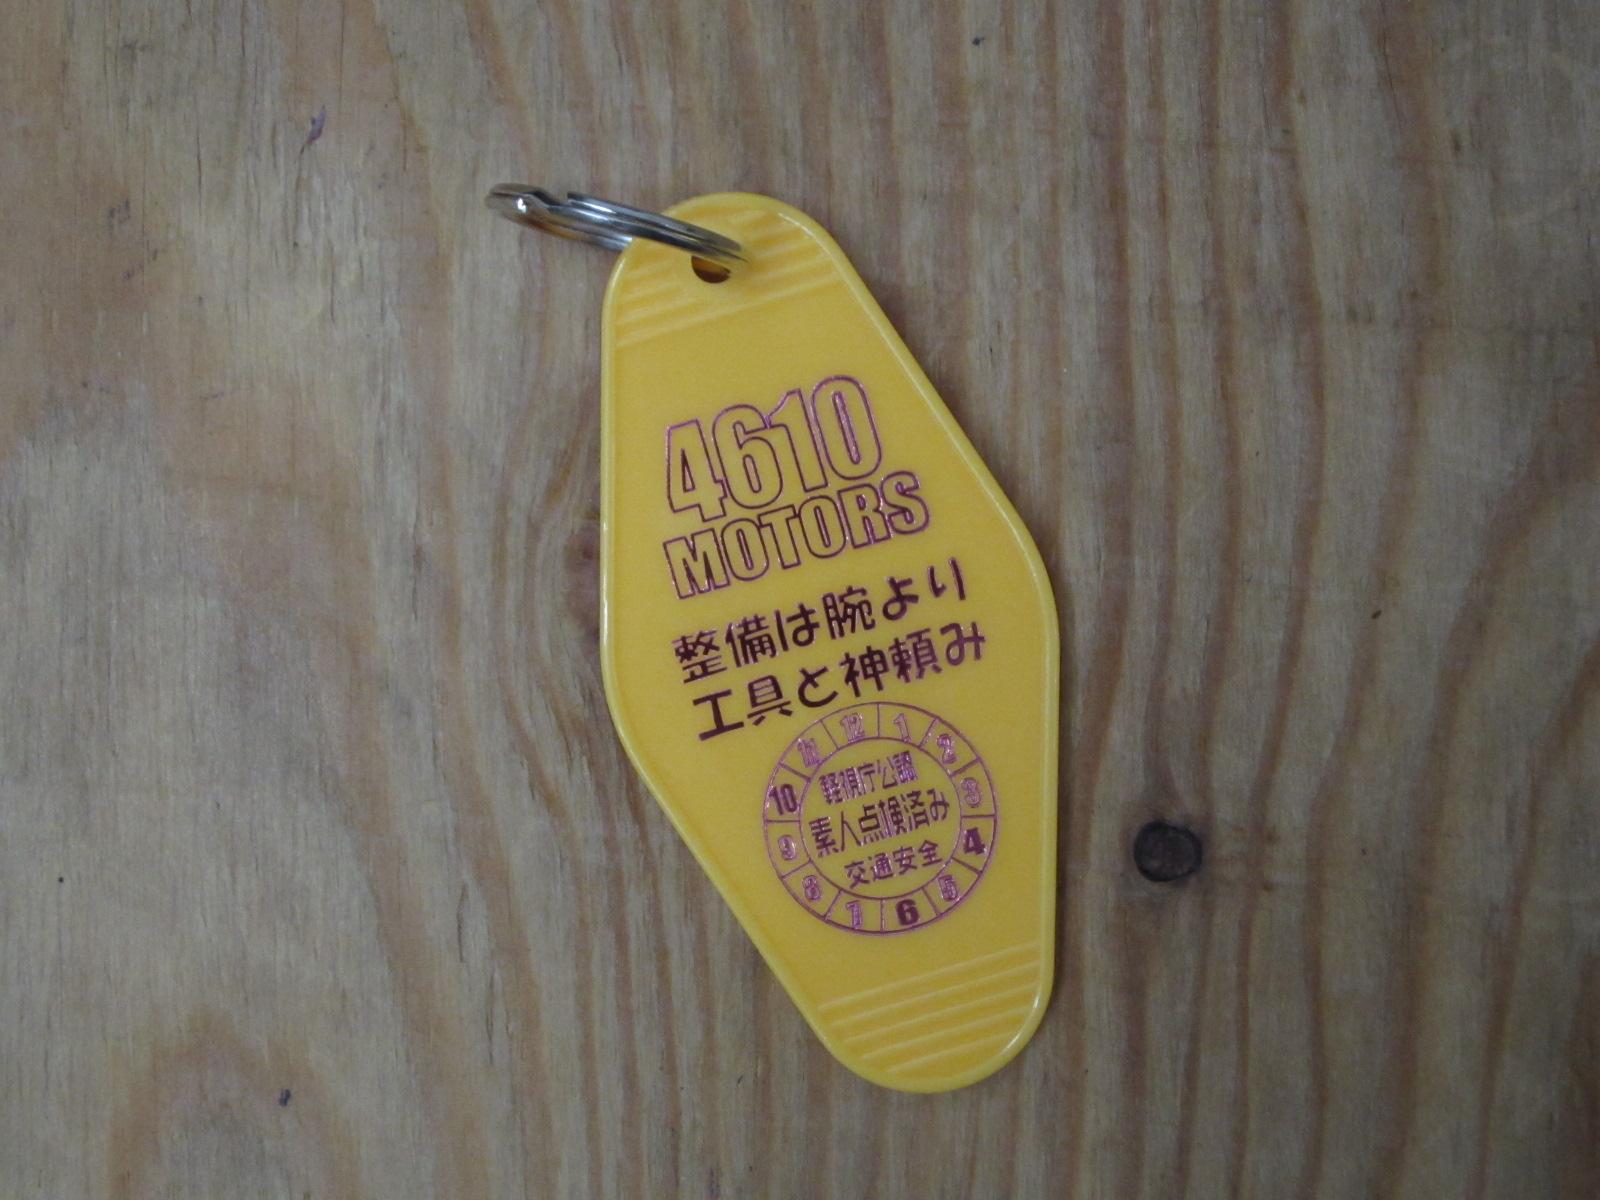 4610MOTORS MOTEL Key Ring YEL シロウトモータース★MOTEL K/R☆モーテルキーリング★黄色